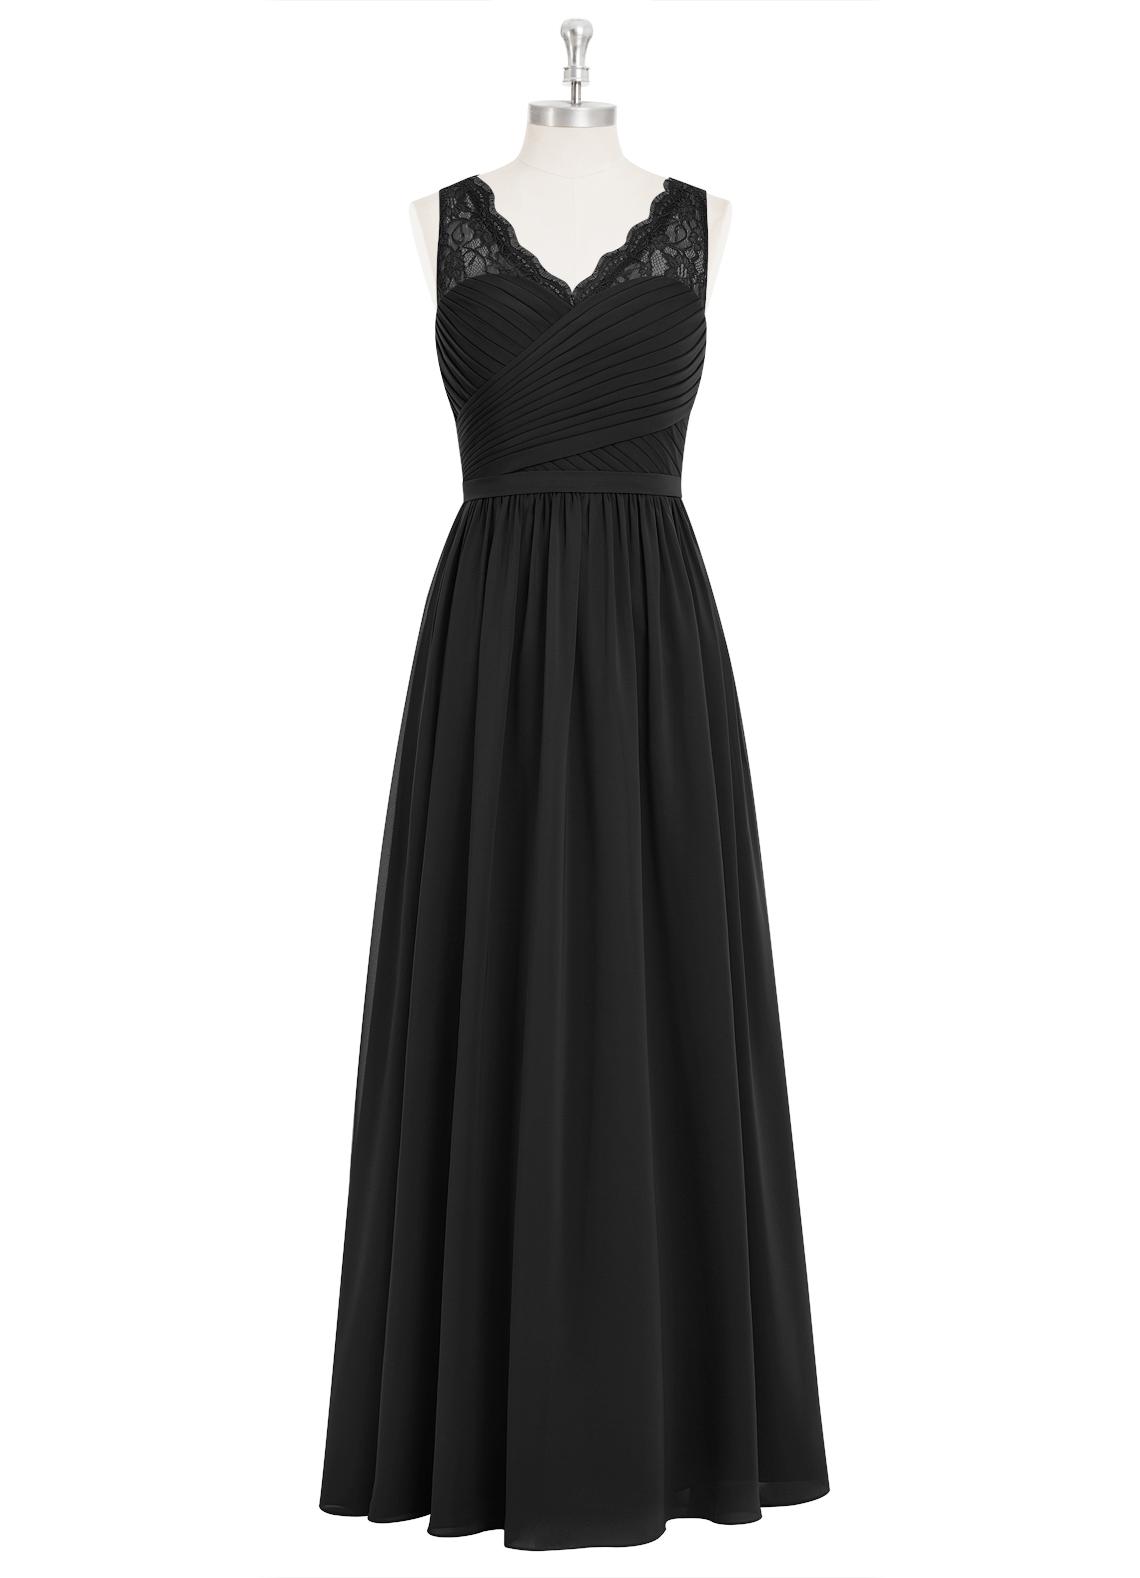 AZAZIE Beverly Bridesmaid Dress